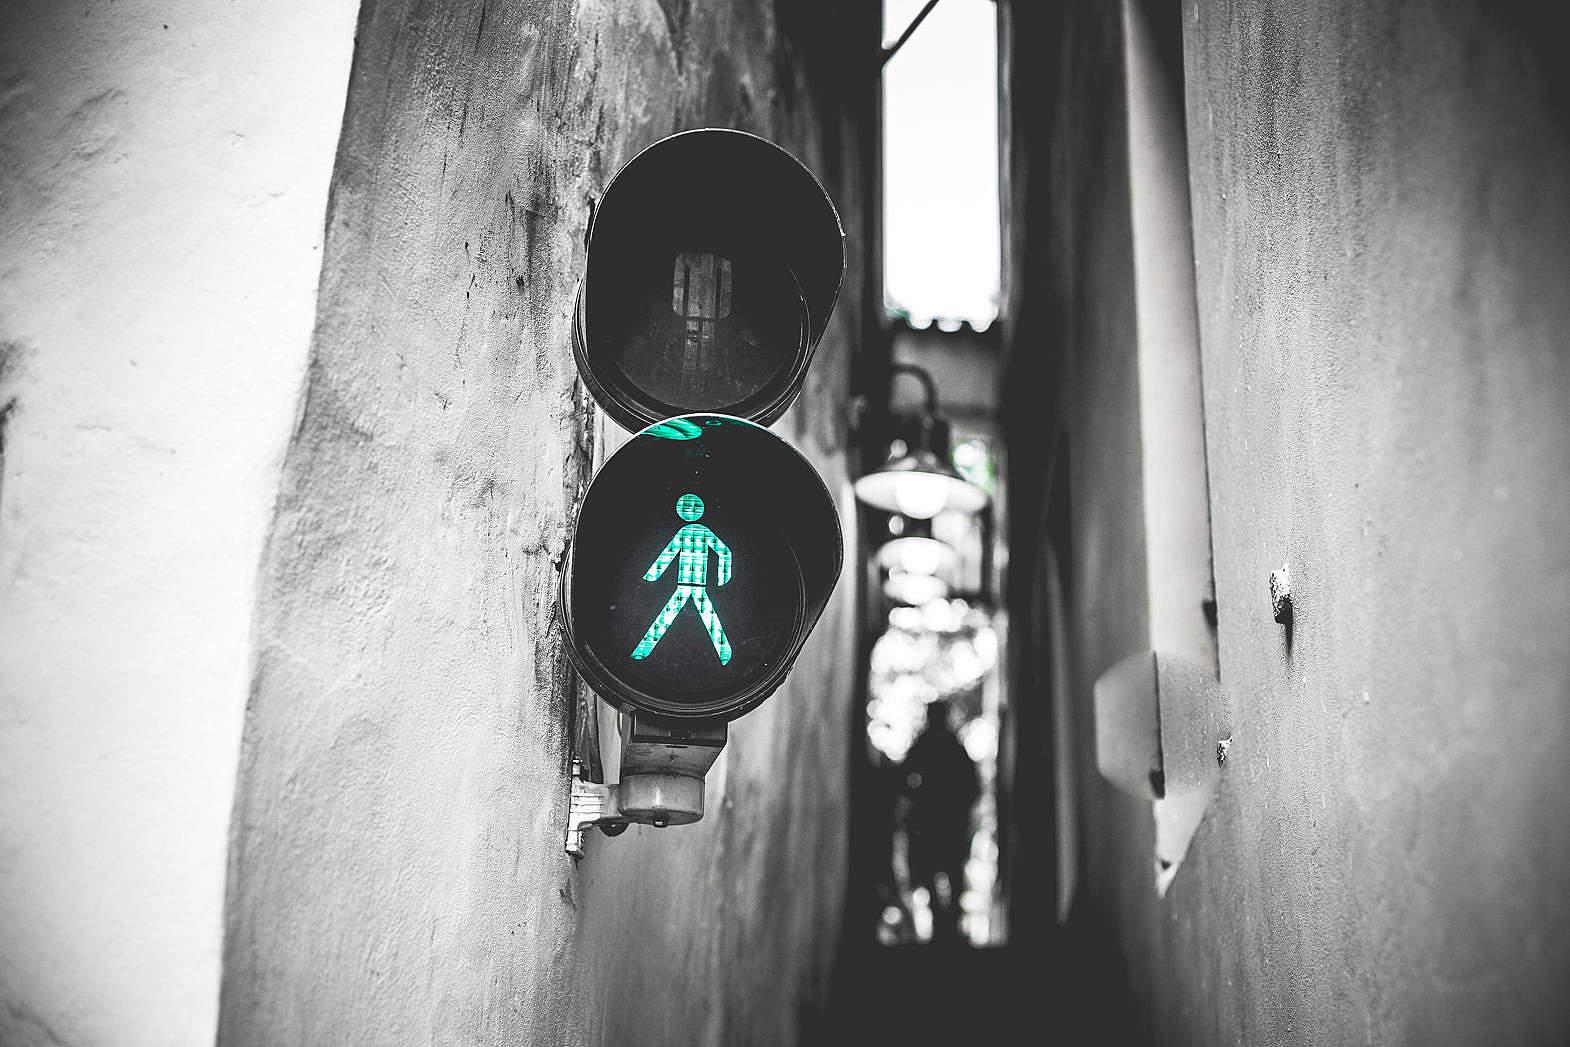 Green Traffic Light Walk Signal in Prague Narrowest Street Free Stock Photo Download